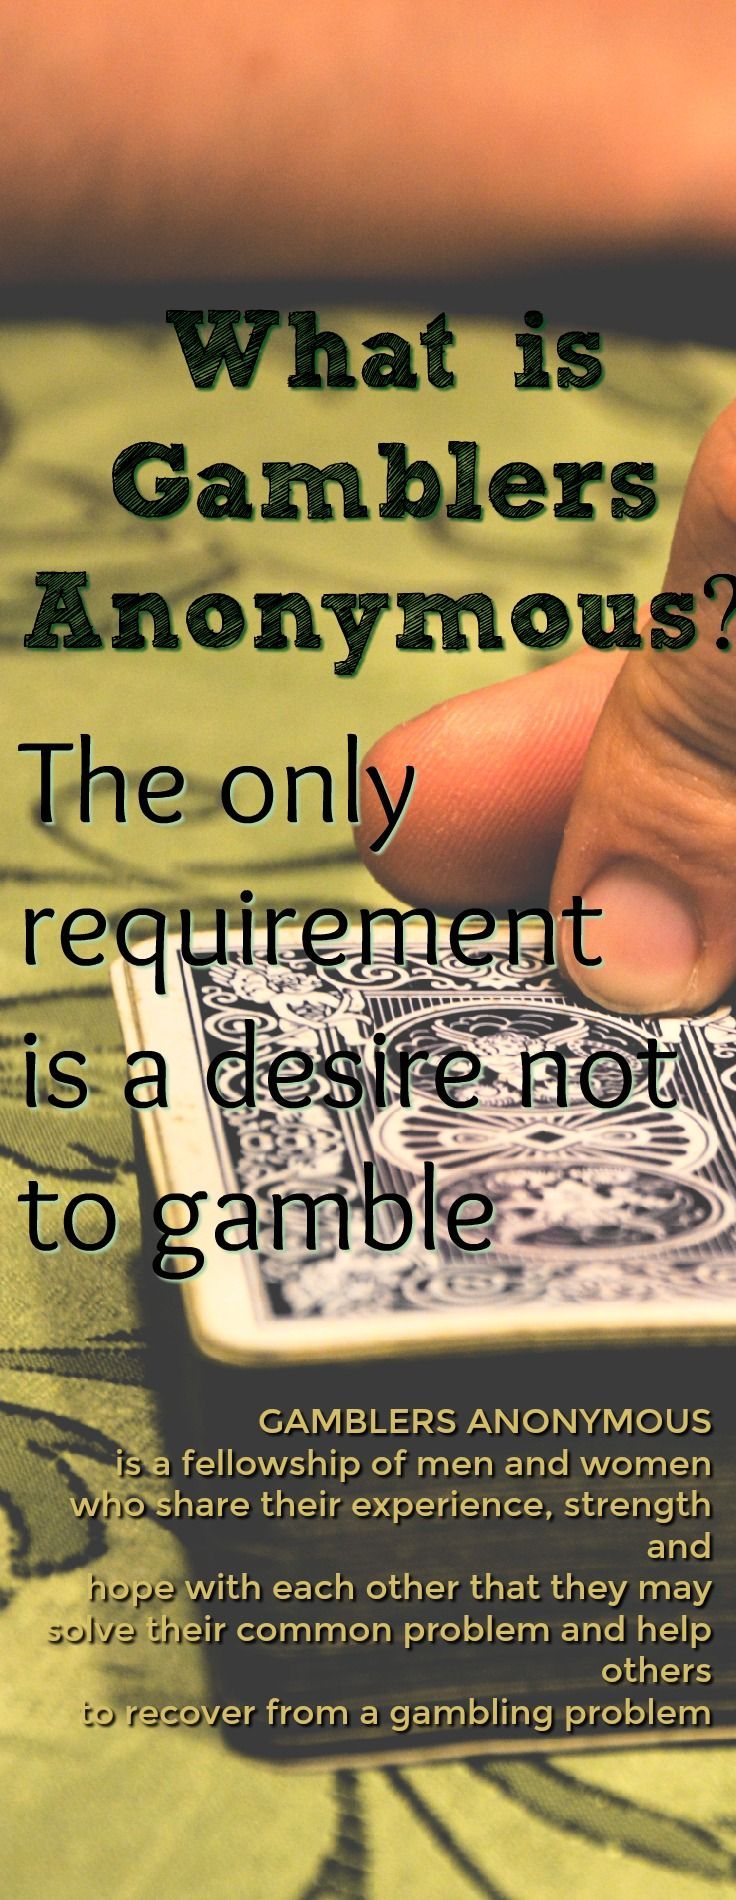 You are a gambler 85